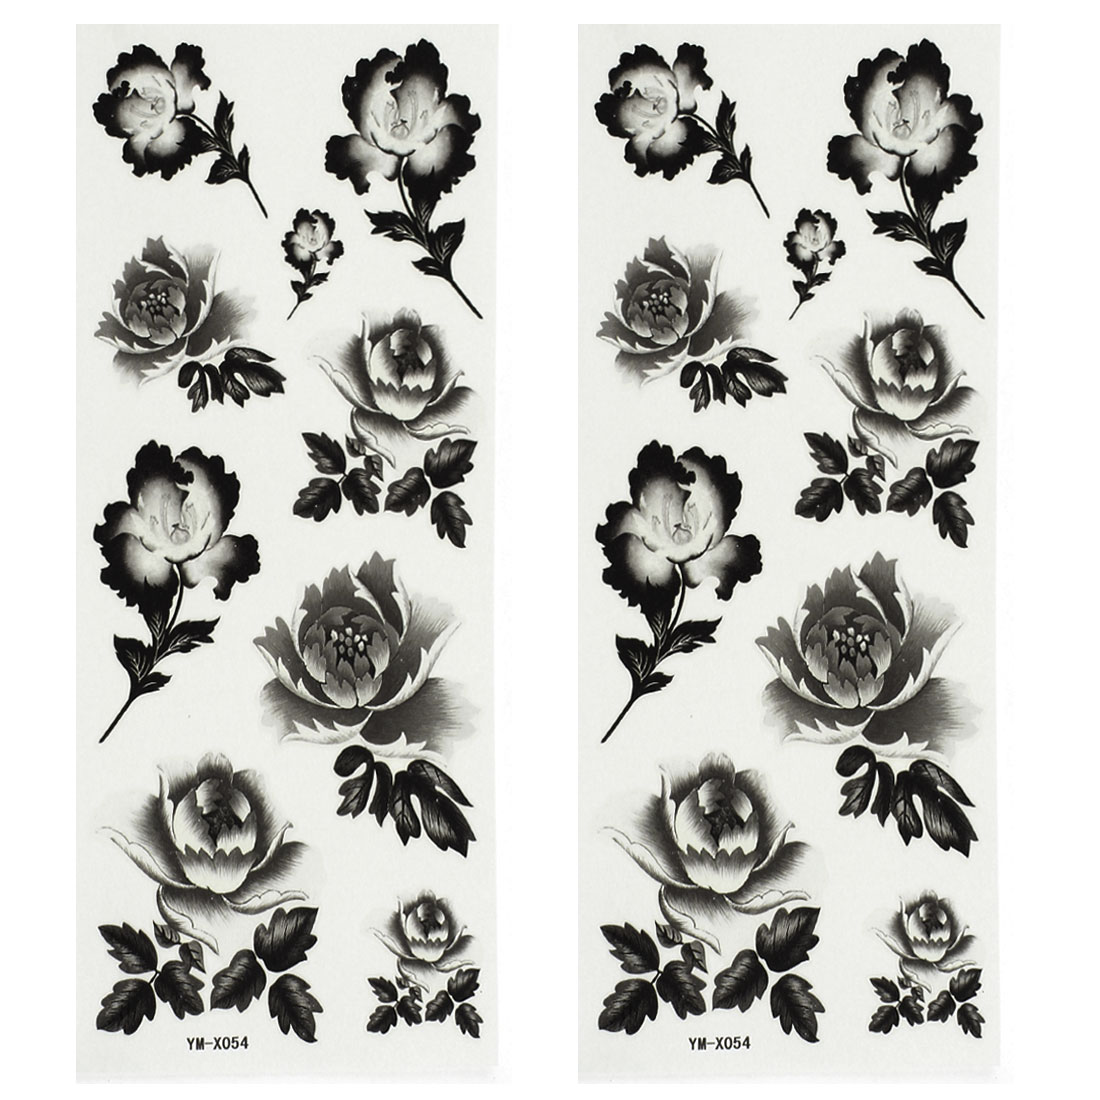 2 Sheets Flower Pattern Body Paper Sticker Temporary Tattoos Gray Black